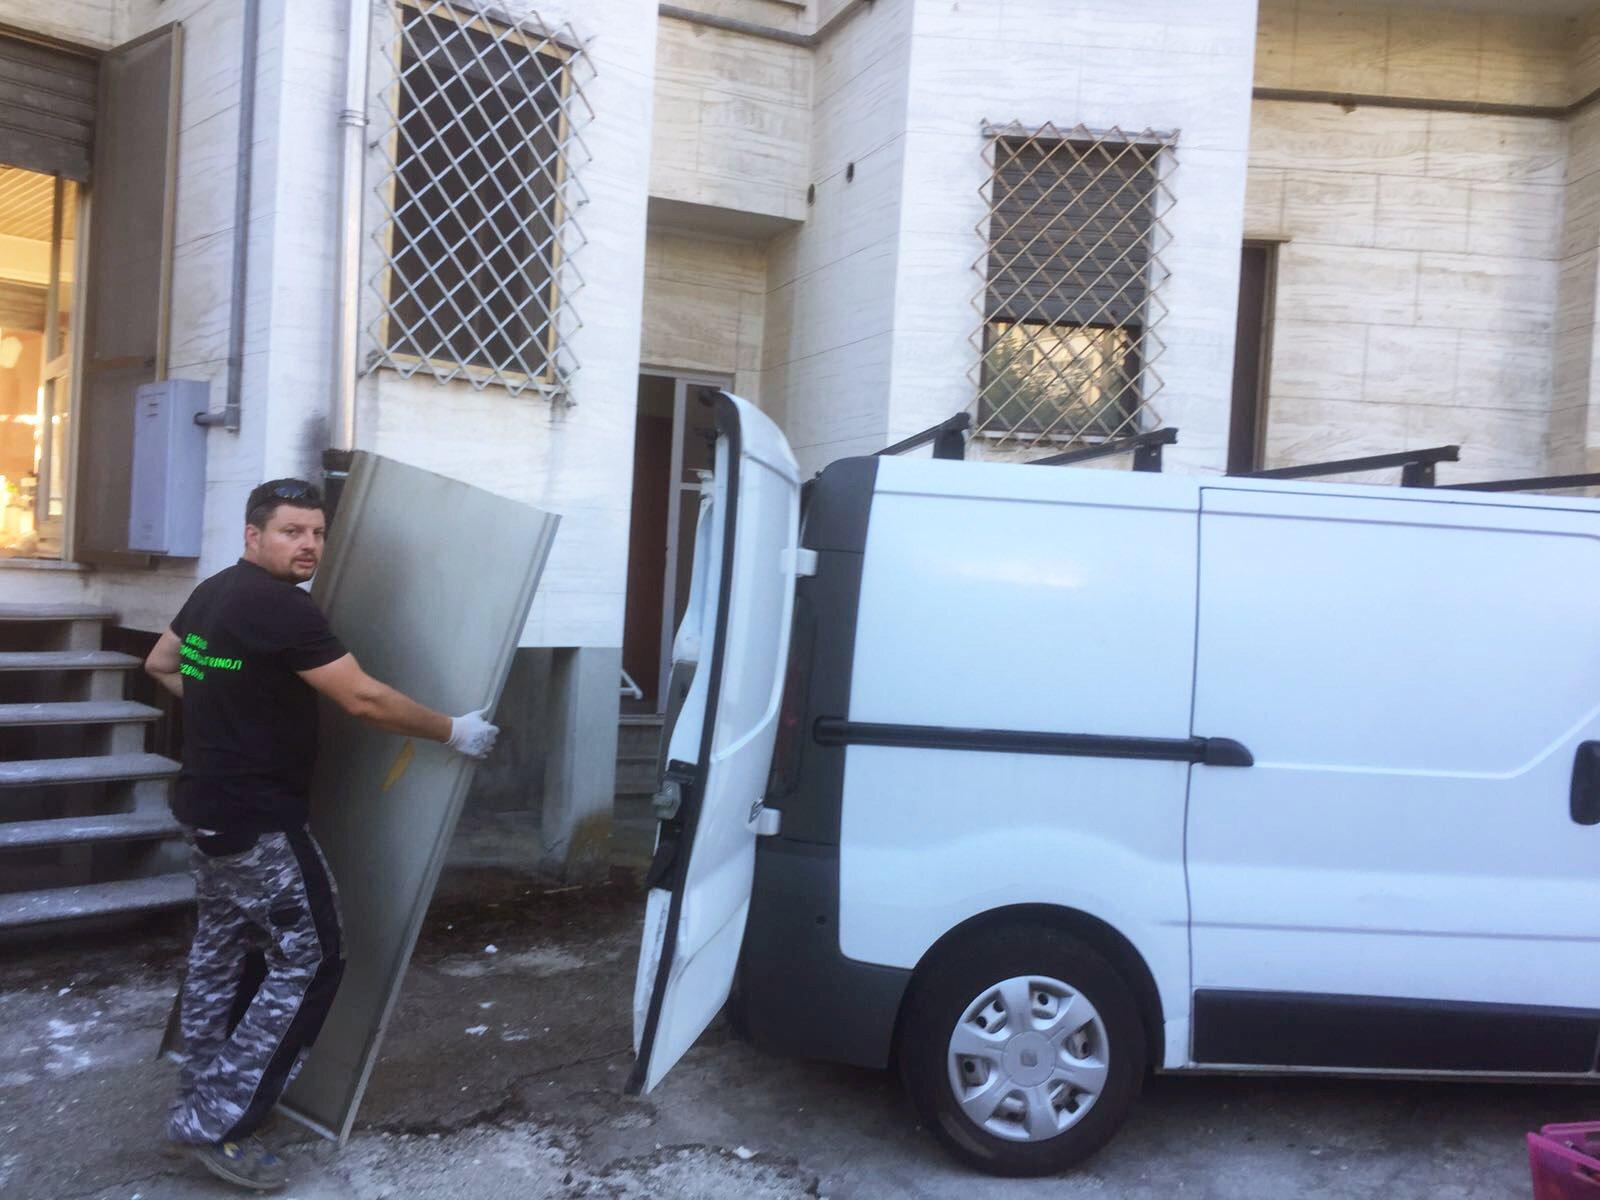 un uomo davanti a due furgoni bianchi